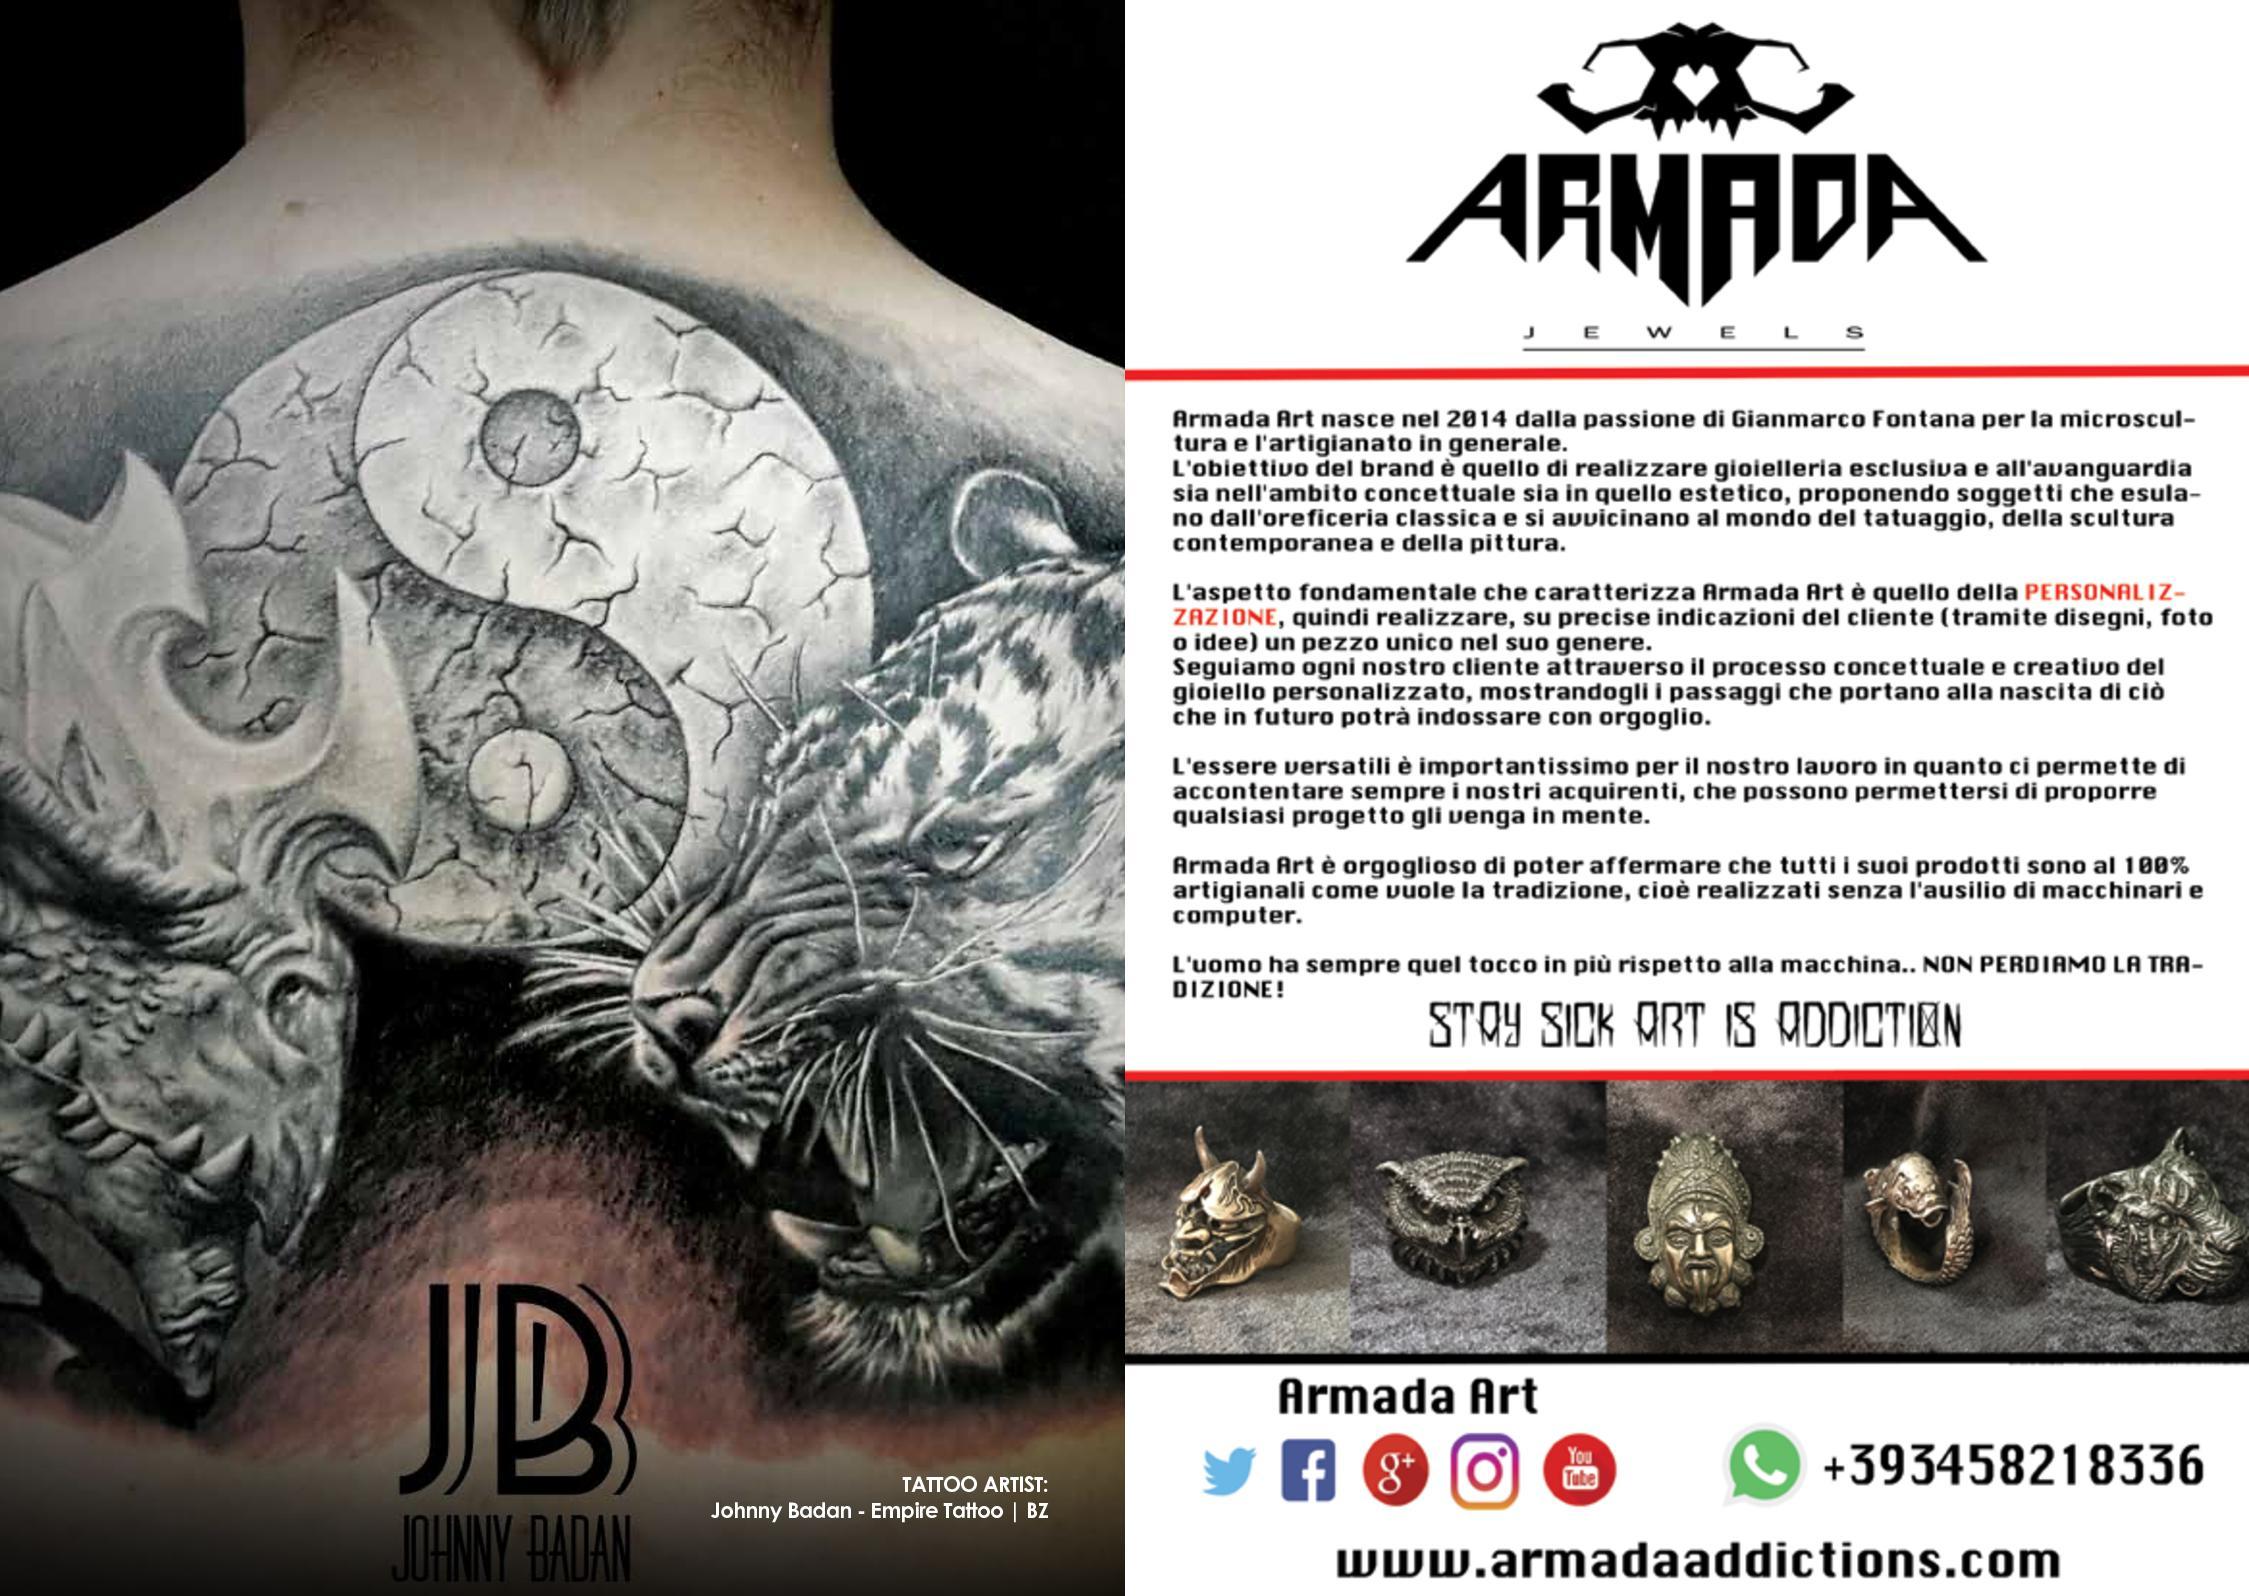 Catalogo Tattoo 2017 biella e pistone tattoo – ardusat